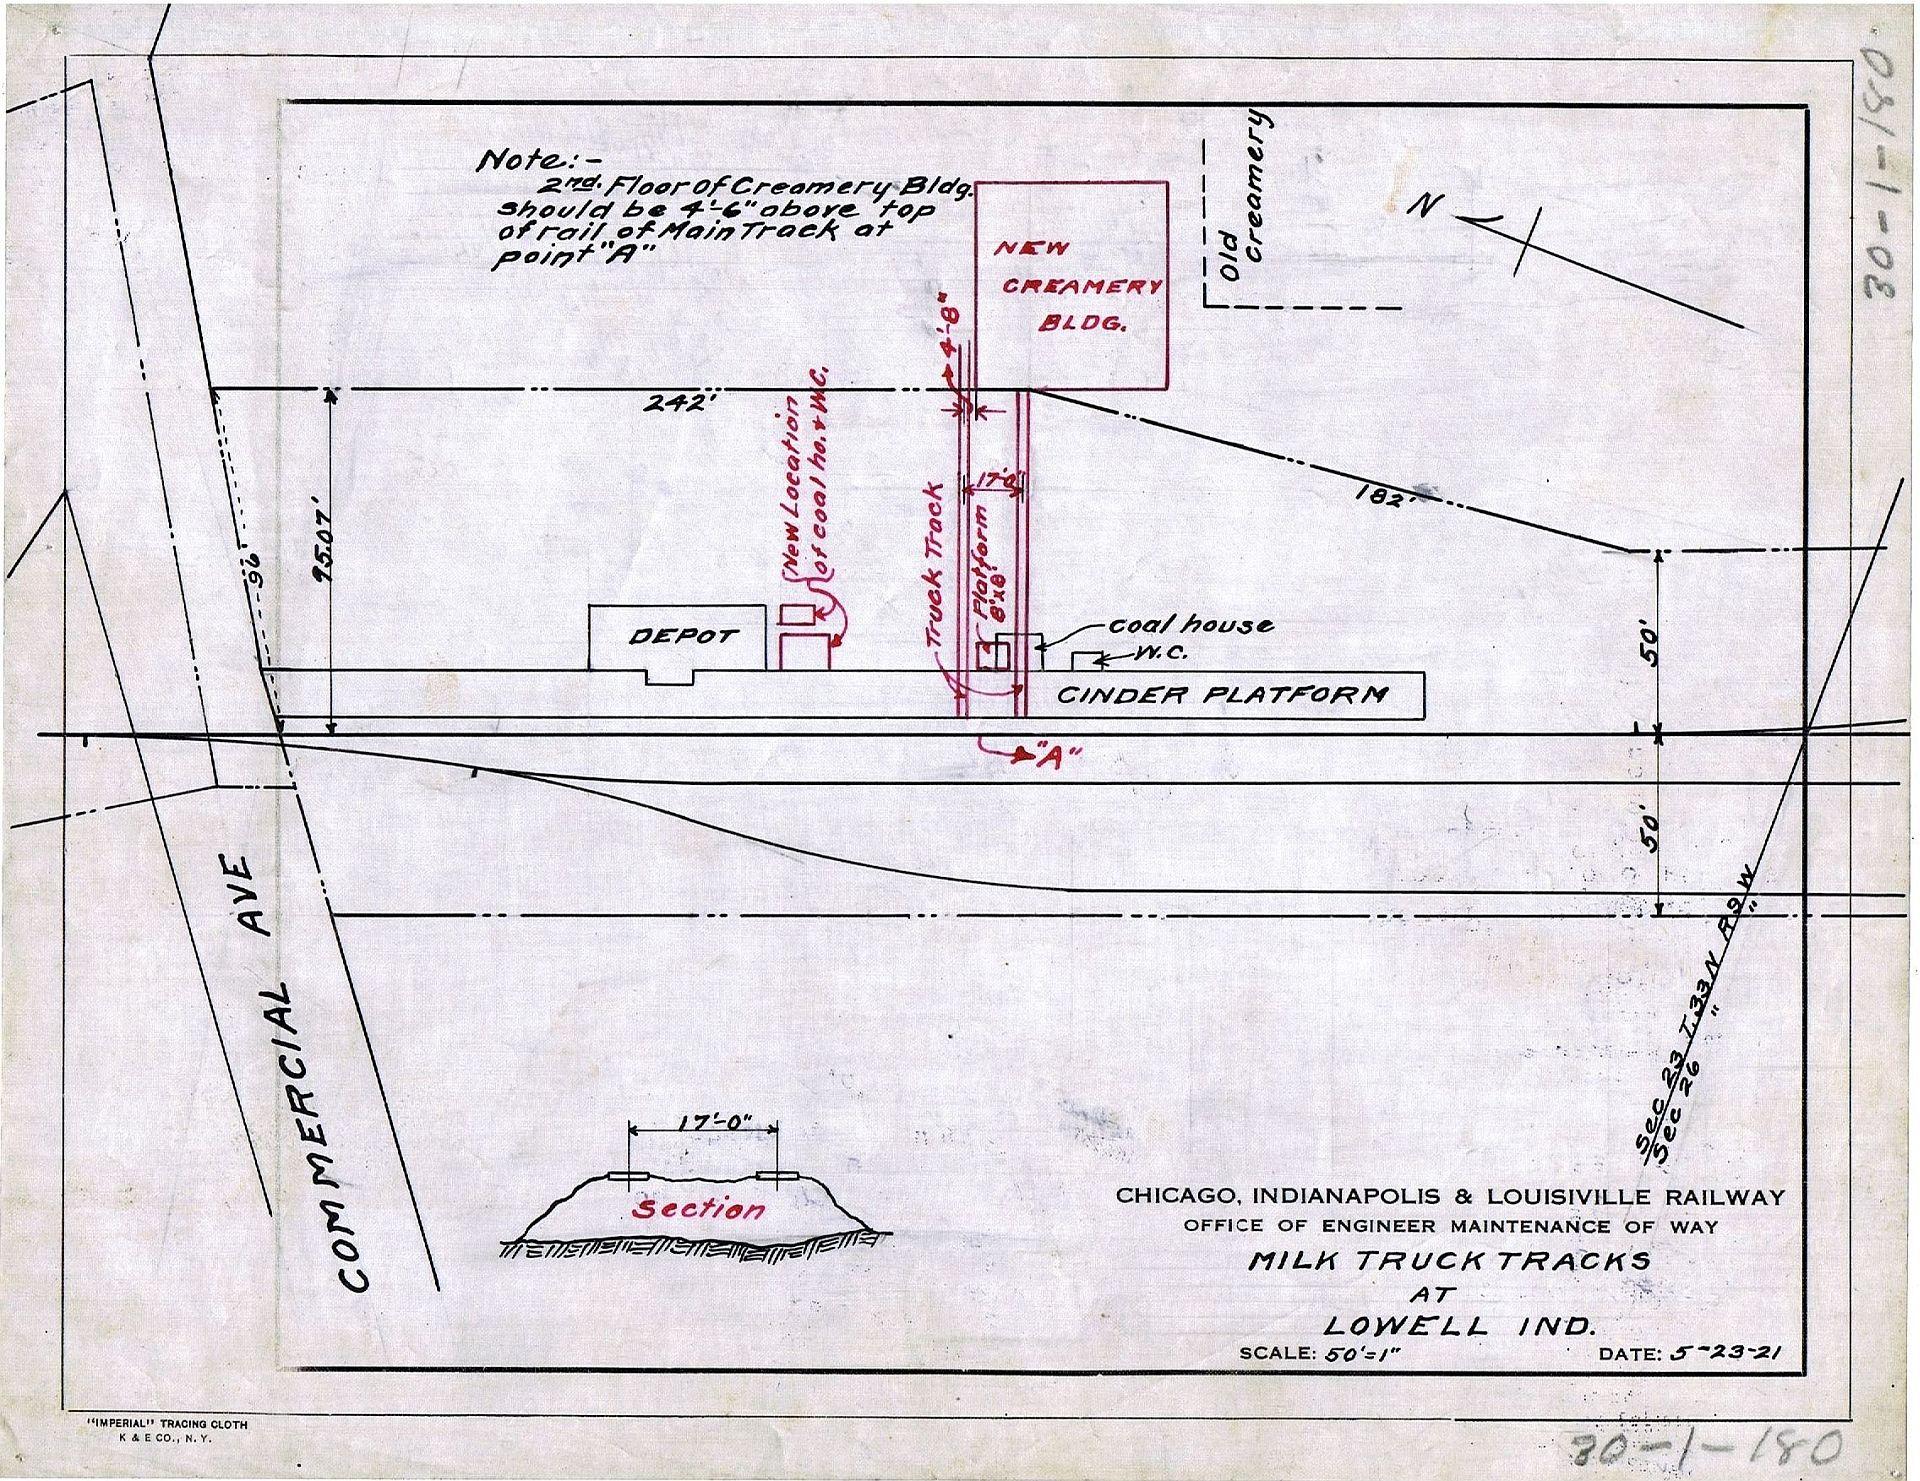 Monon Railroad Historical-Technical Society